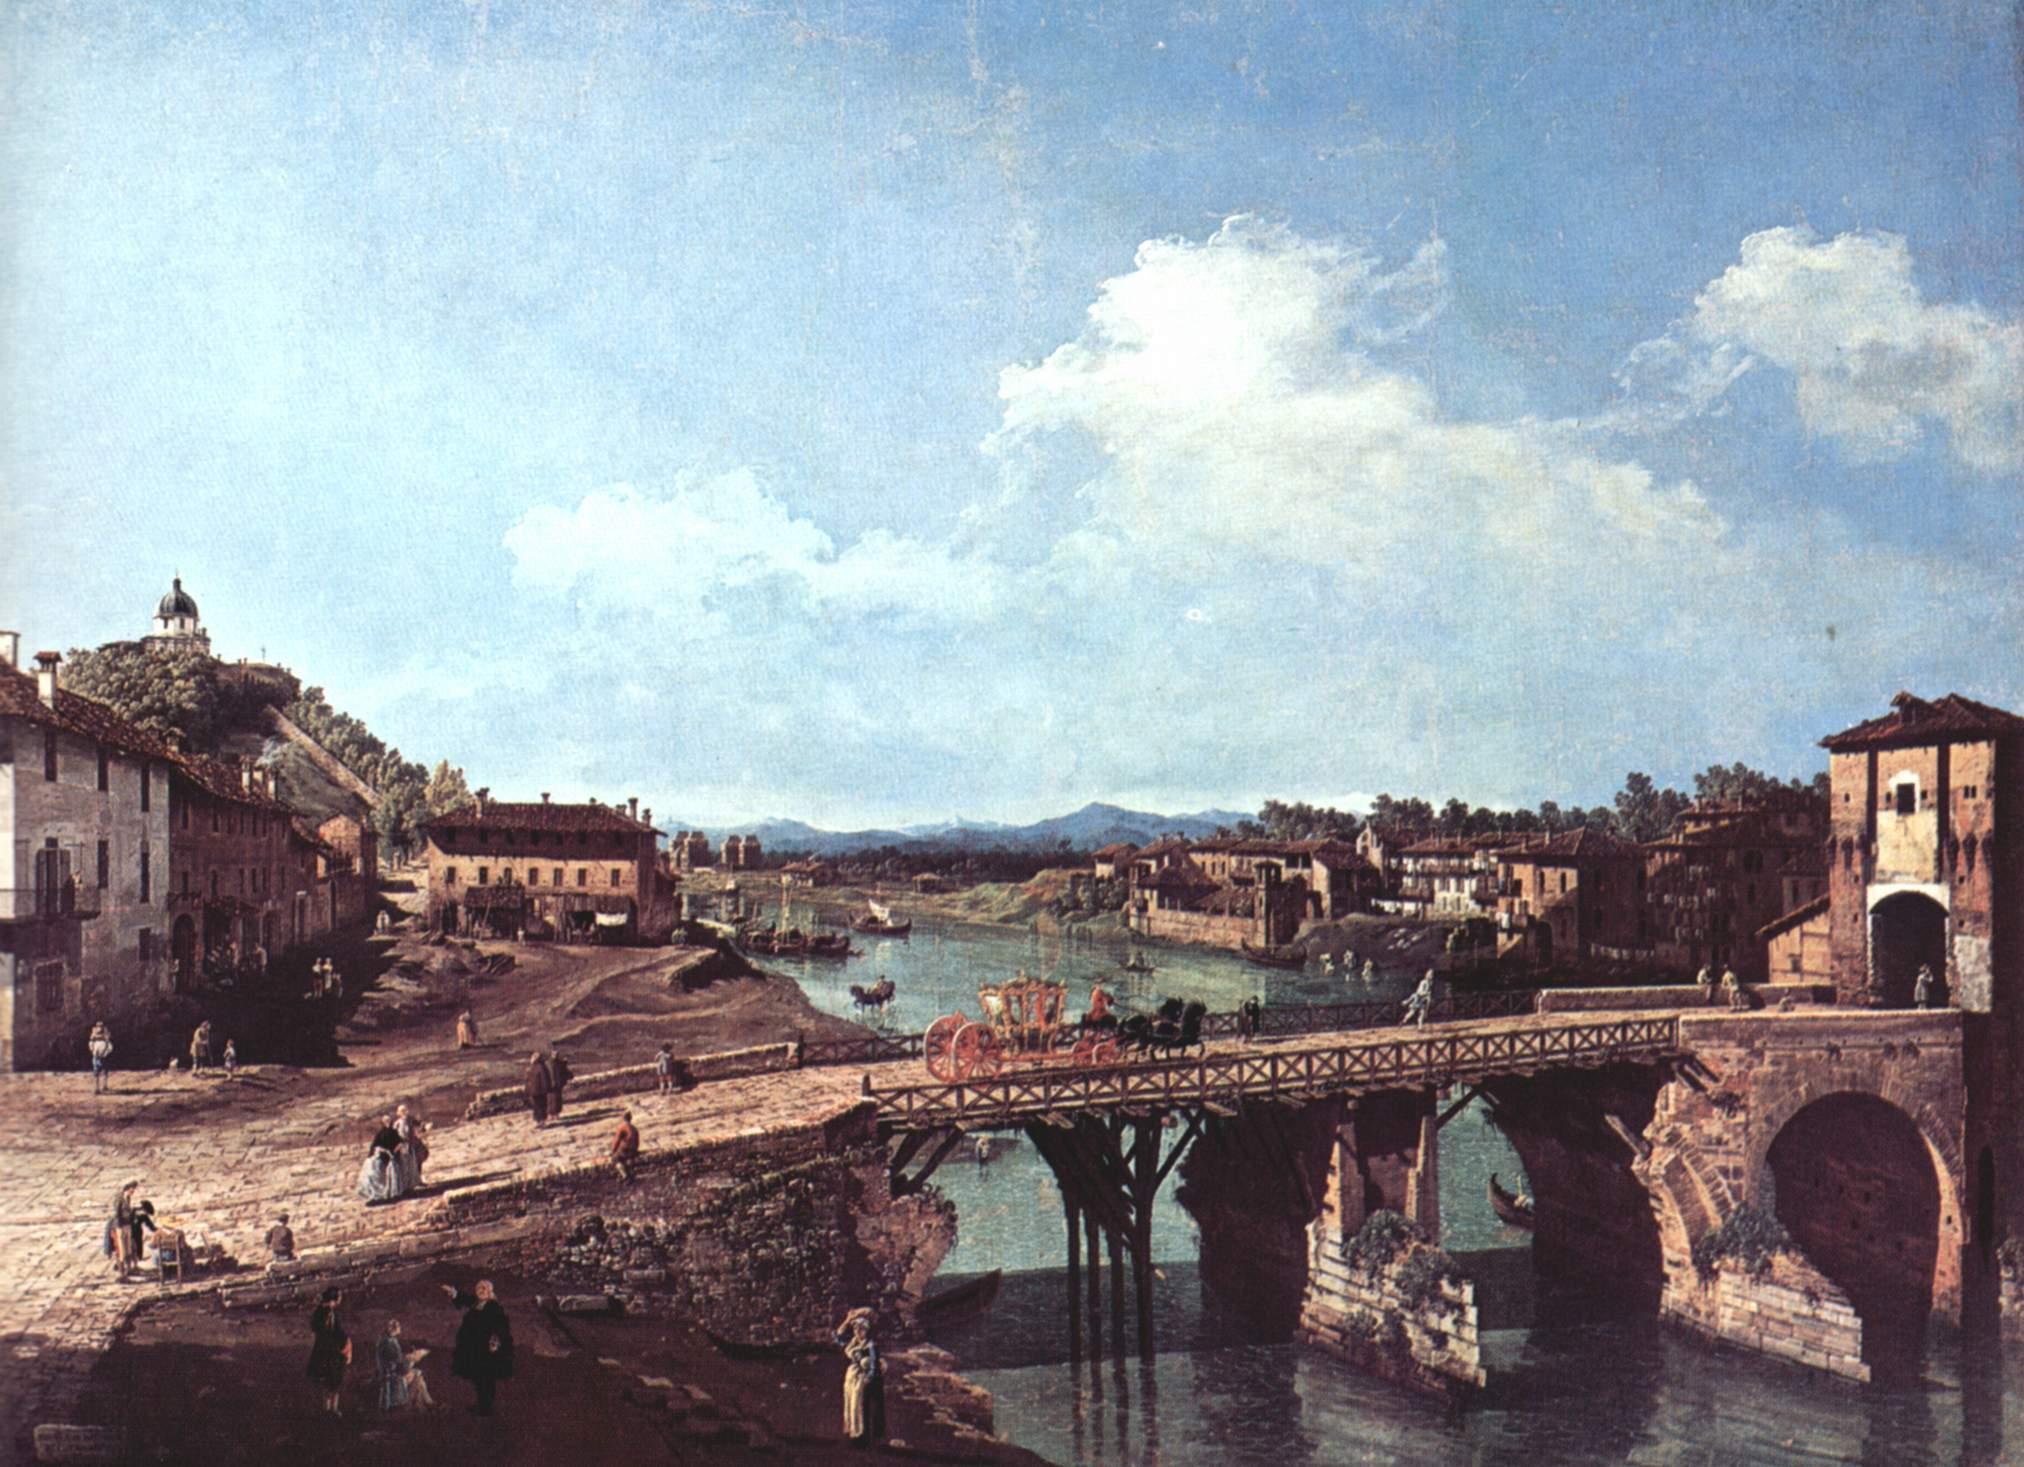 Вид на античный мост на реке По в Турине, Джованни Антонио Каналетто 1